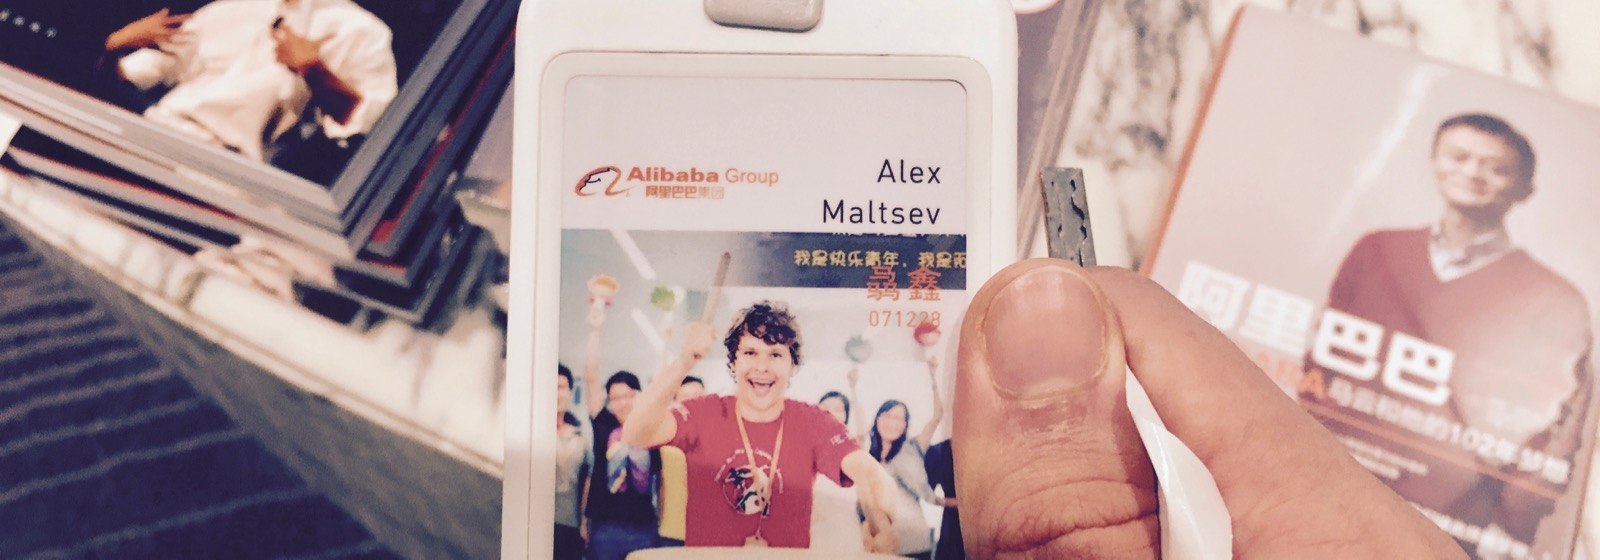 Последний день в Алибаба / Александр Мальцев